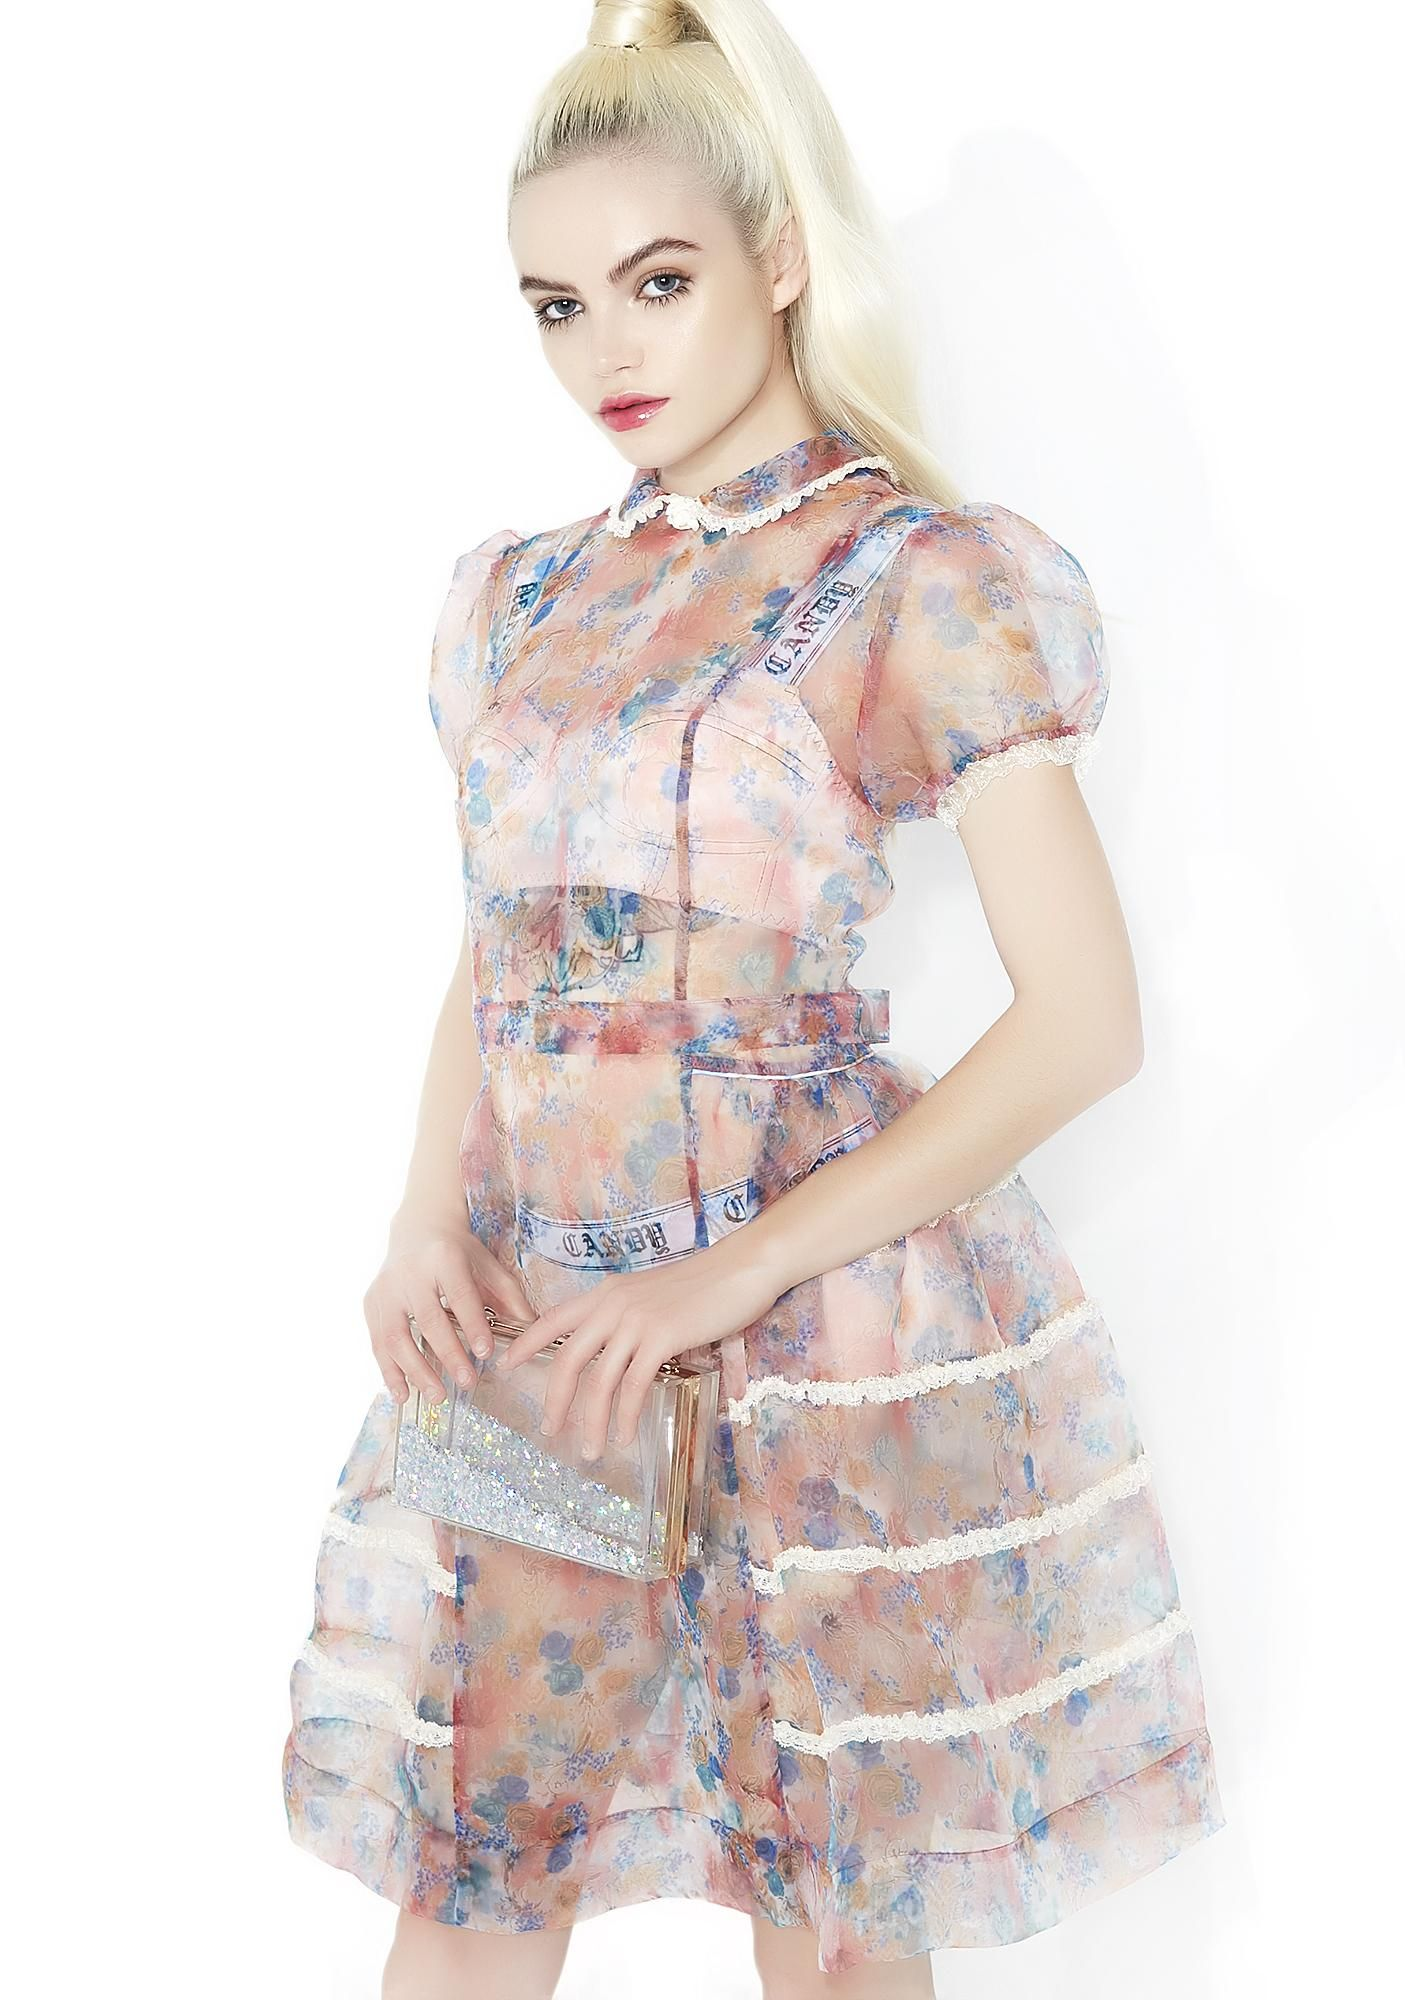 c5648a0a3b Sugar Thrillz Rococo Rose Sheer Dress these frills signal royalty